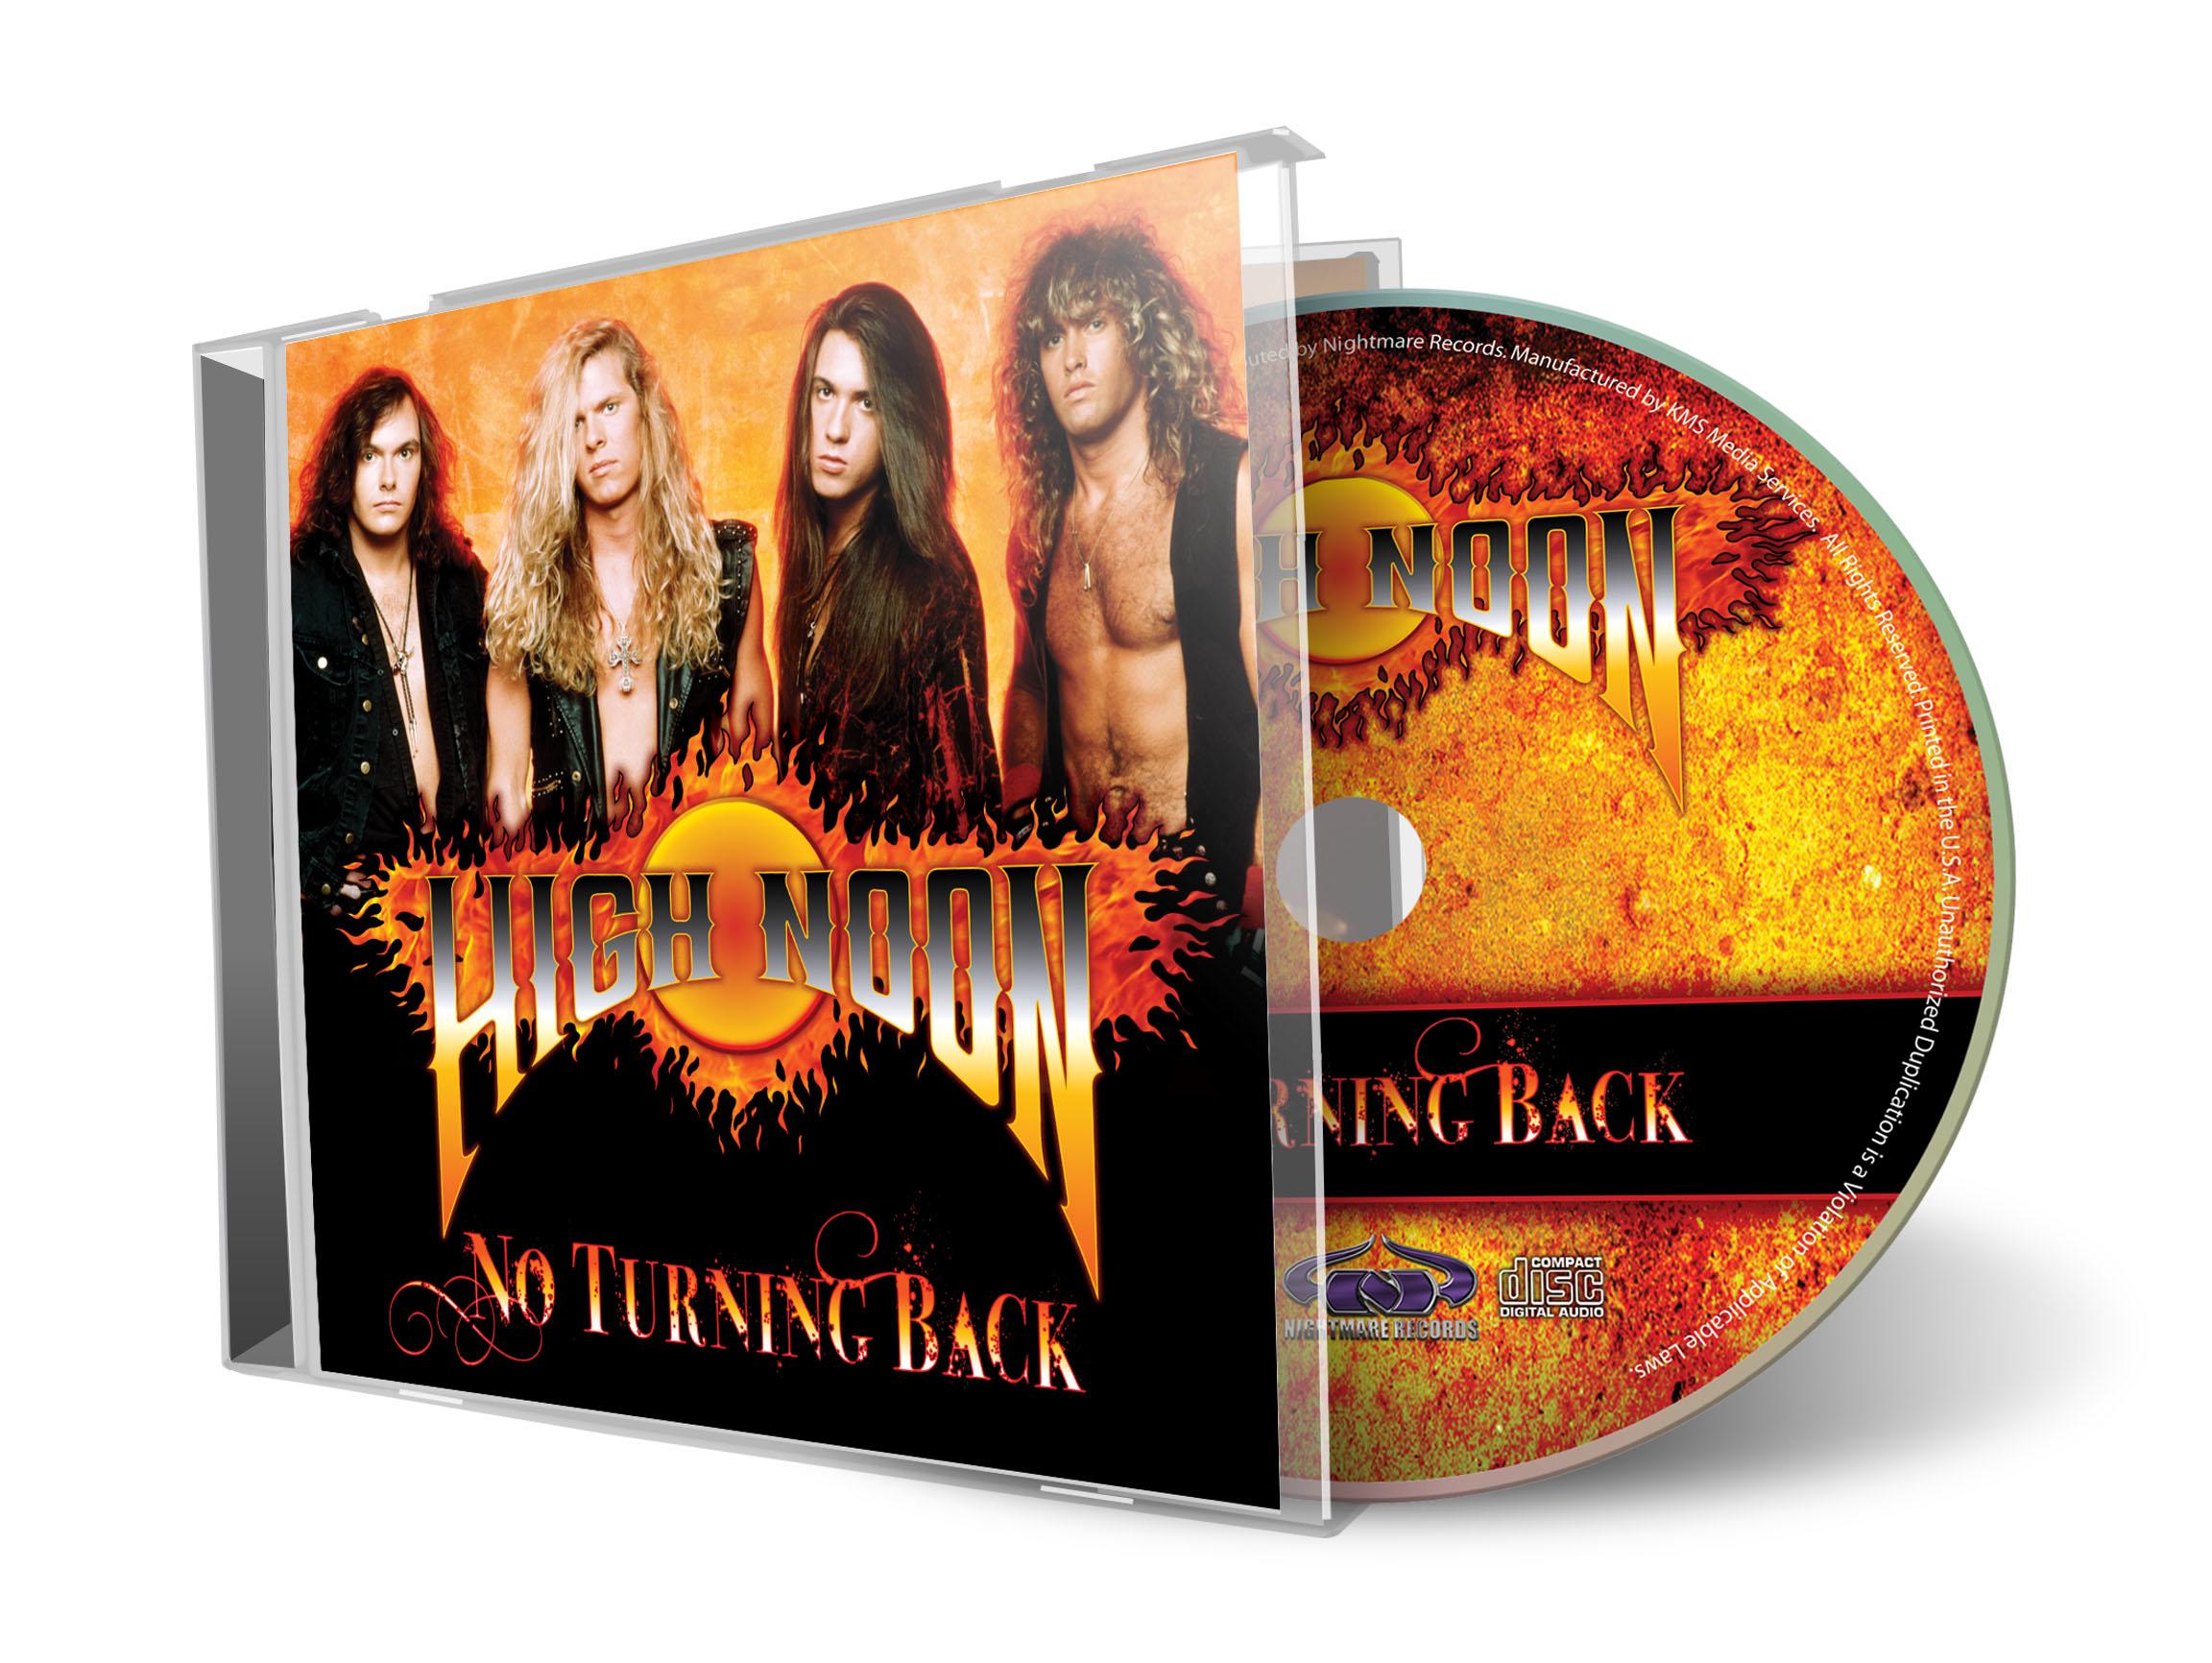 High Noon - CD Mock-Up.jpg